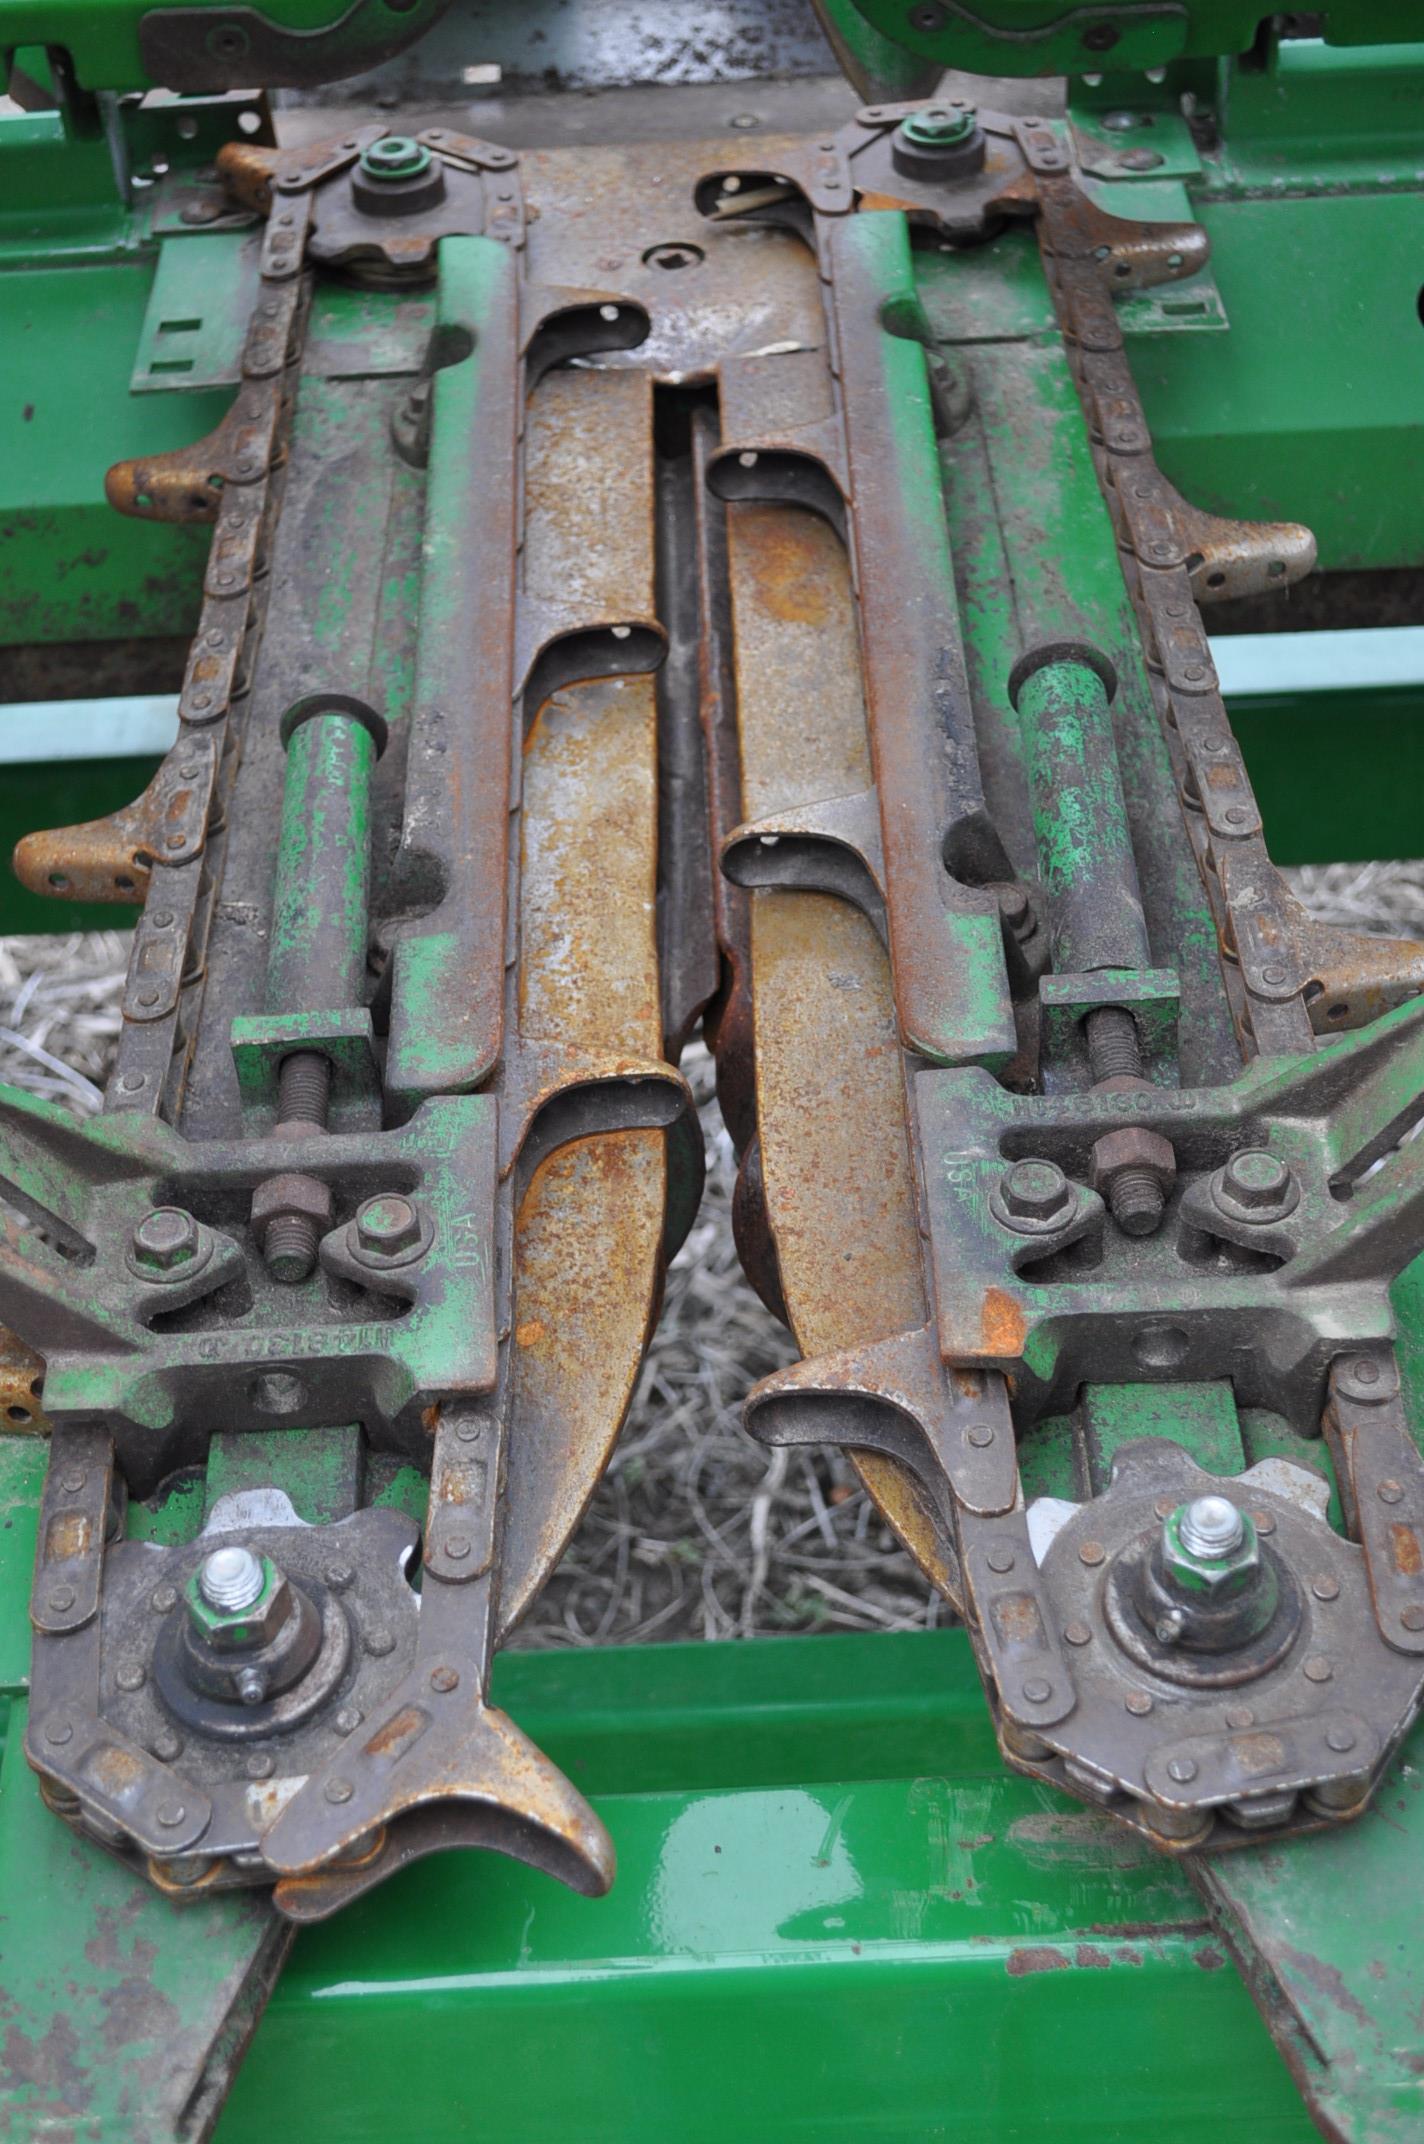 John Deere 693 corn head, poly, hyd drive, down corn reel, pto shafts, SN 655654 - Image 15 of 17